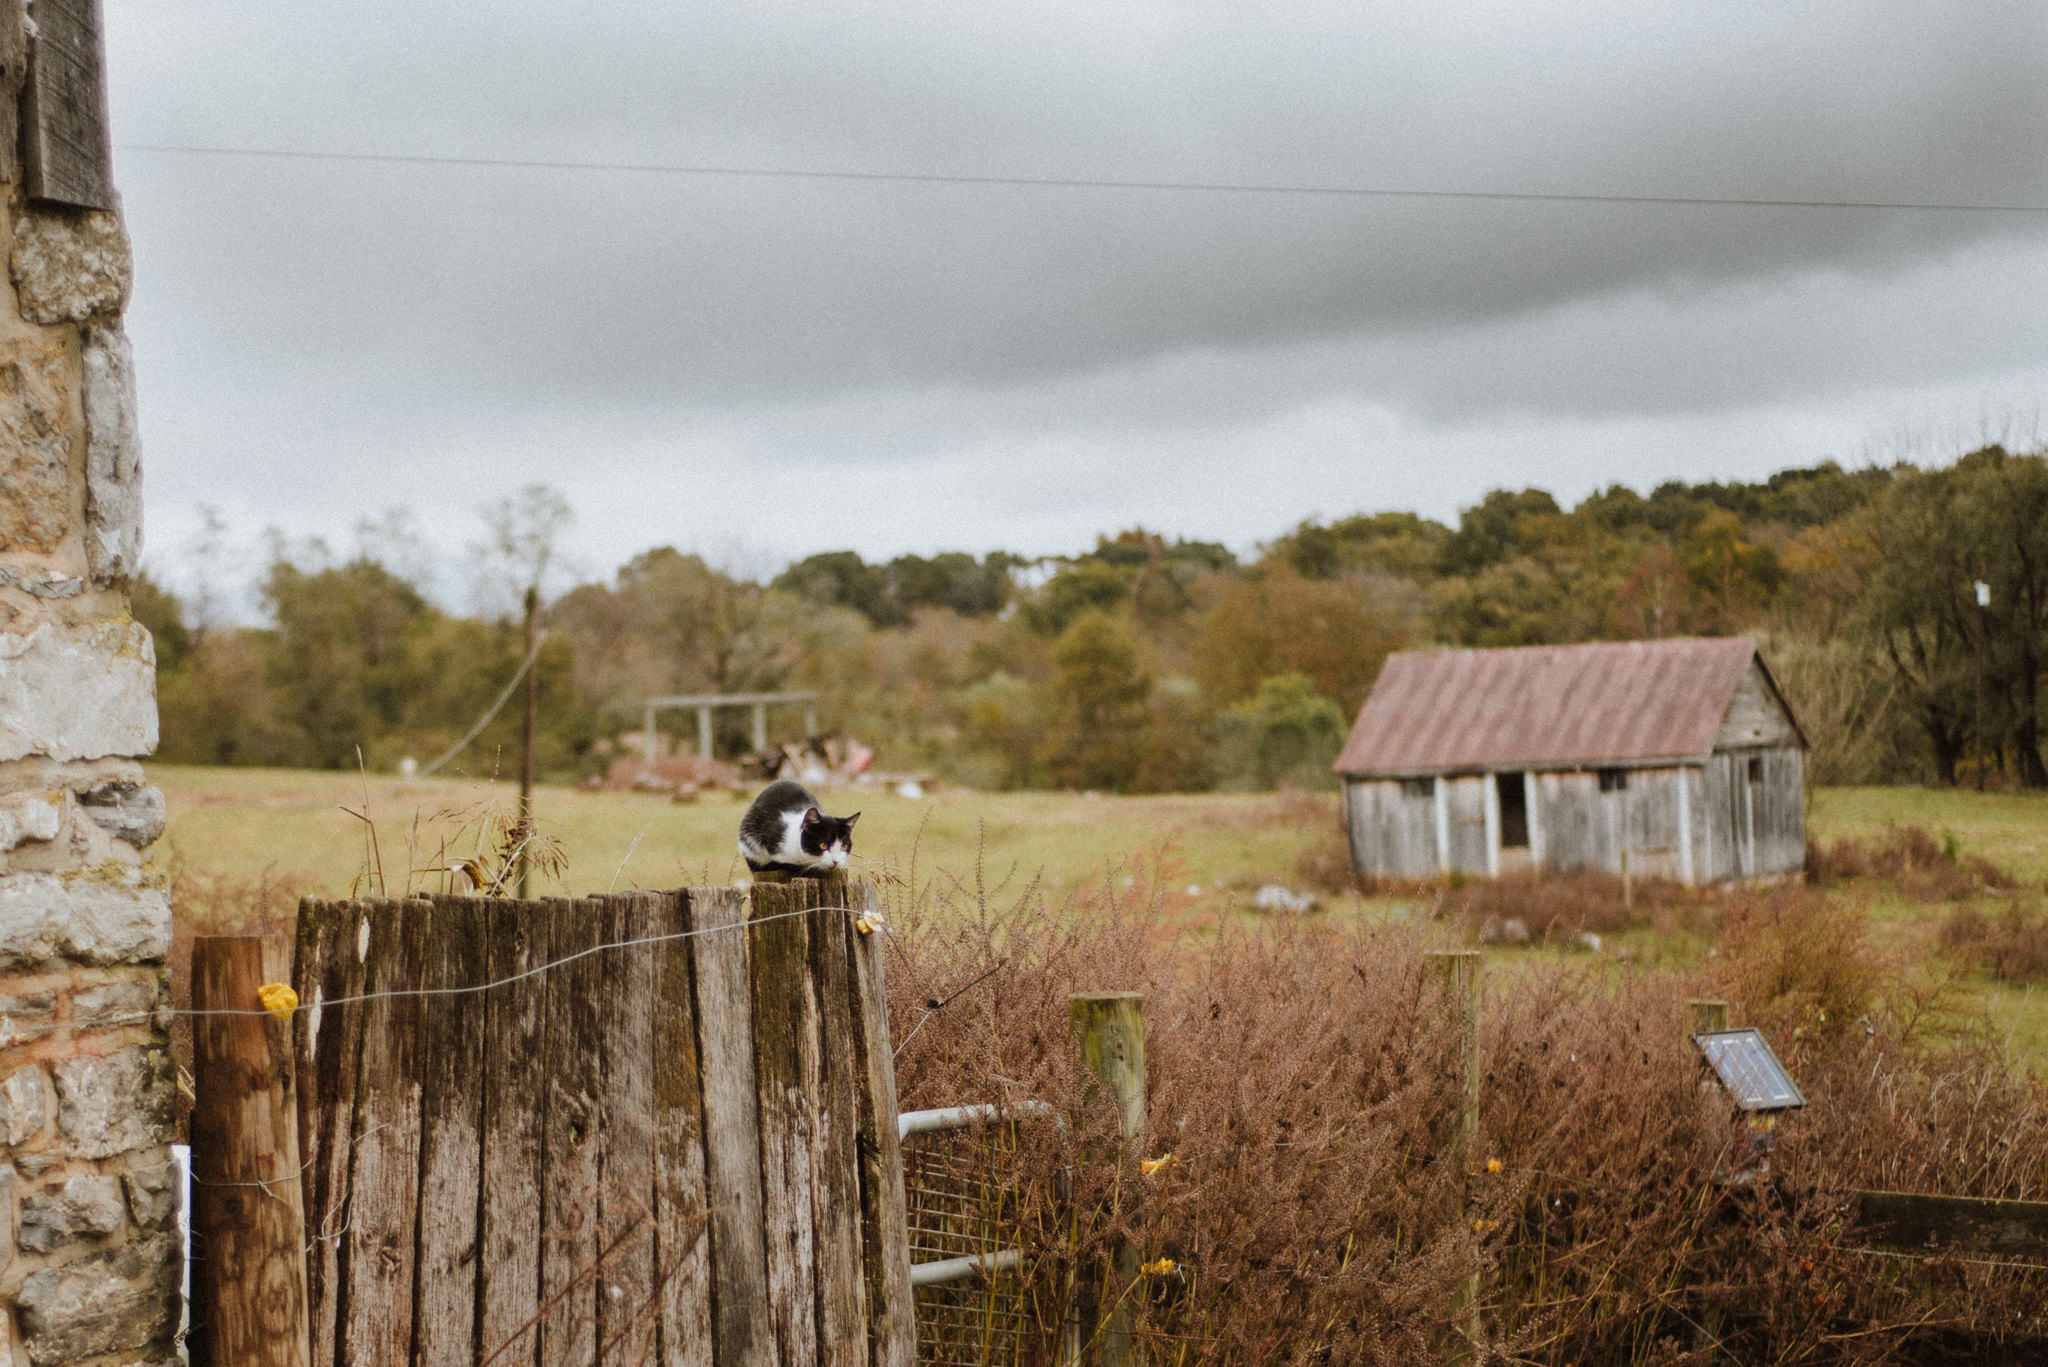 ApkePhotography_Tricia+Mike_WestVirginiaWedding_Farm_7.jpg